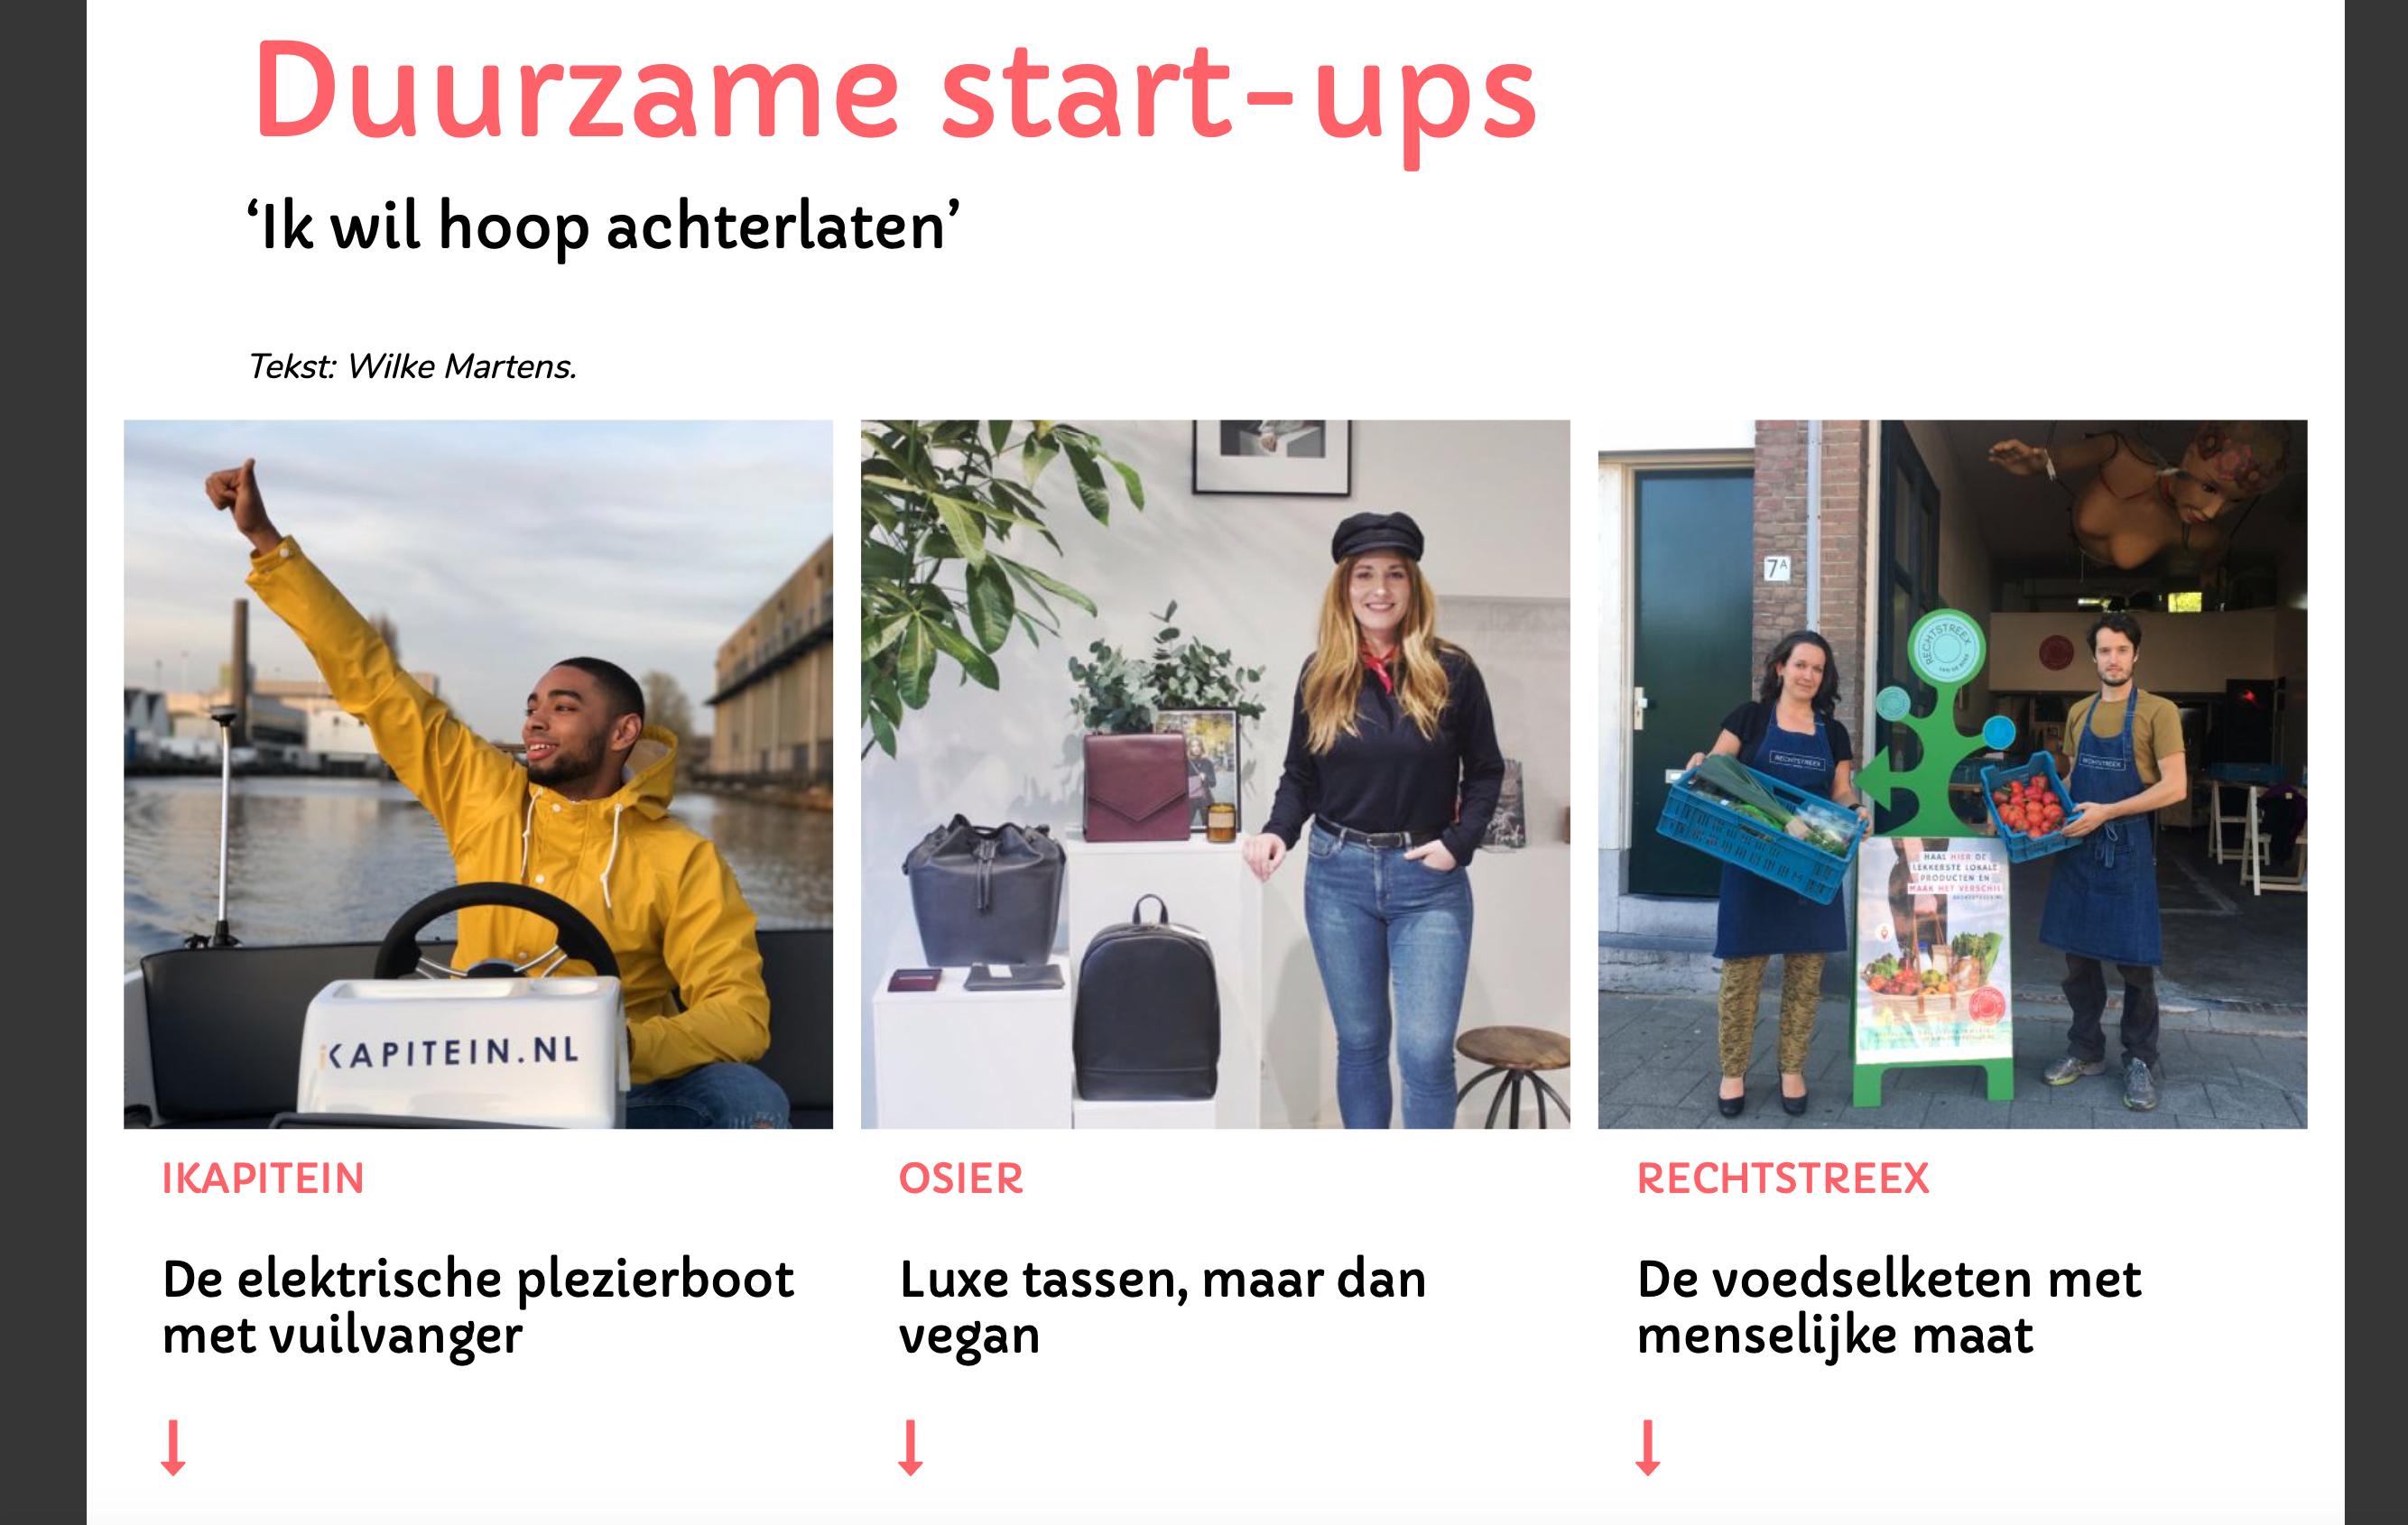 Duurzame start-ups – 'Ik wil  hoop achterlaten'